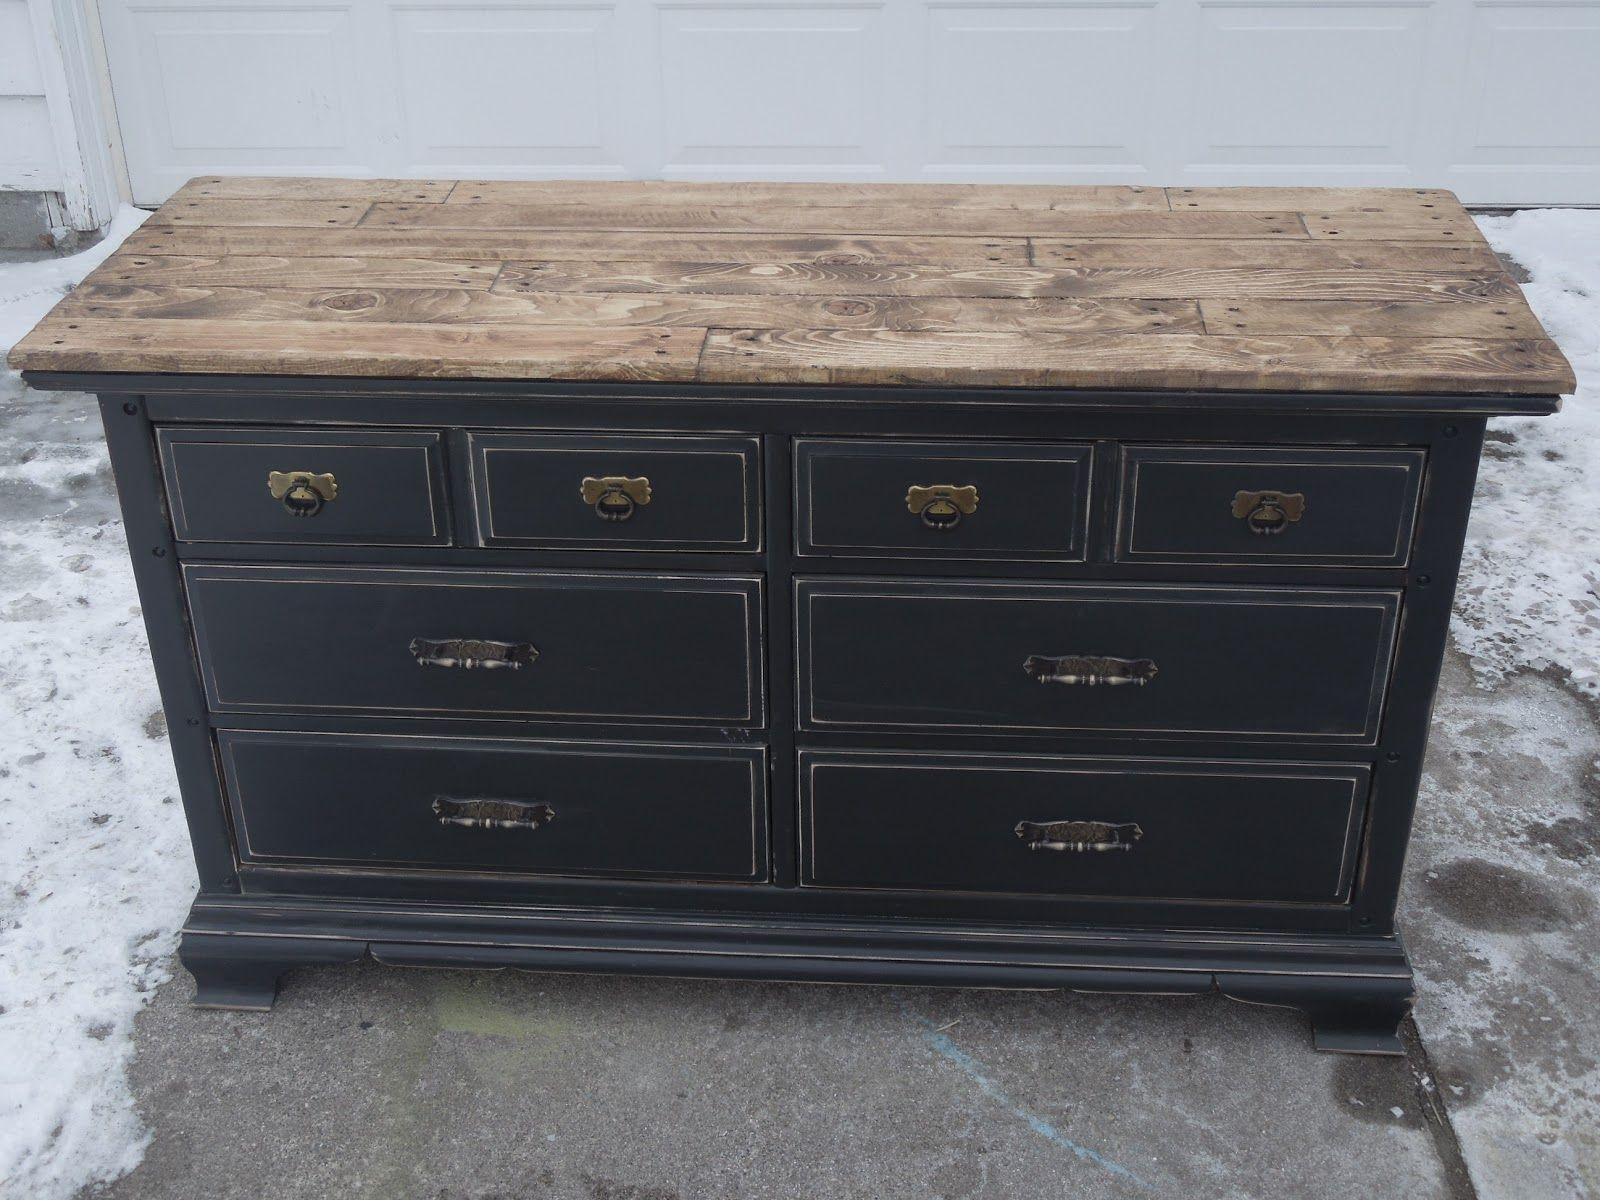 Tattered Lantern Black Dresser 29900 Sold Will Deliver Within